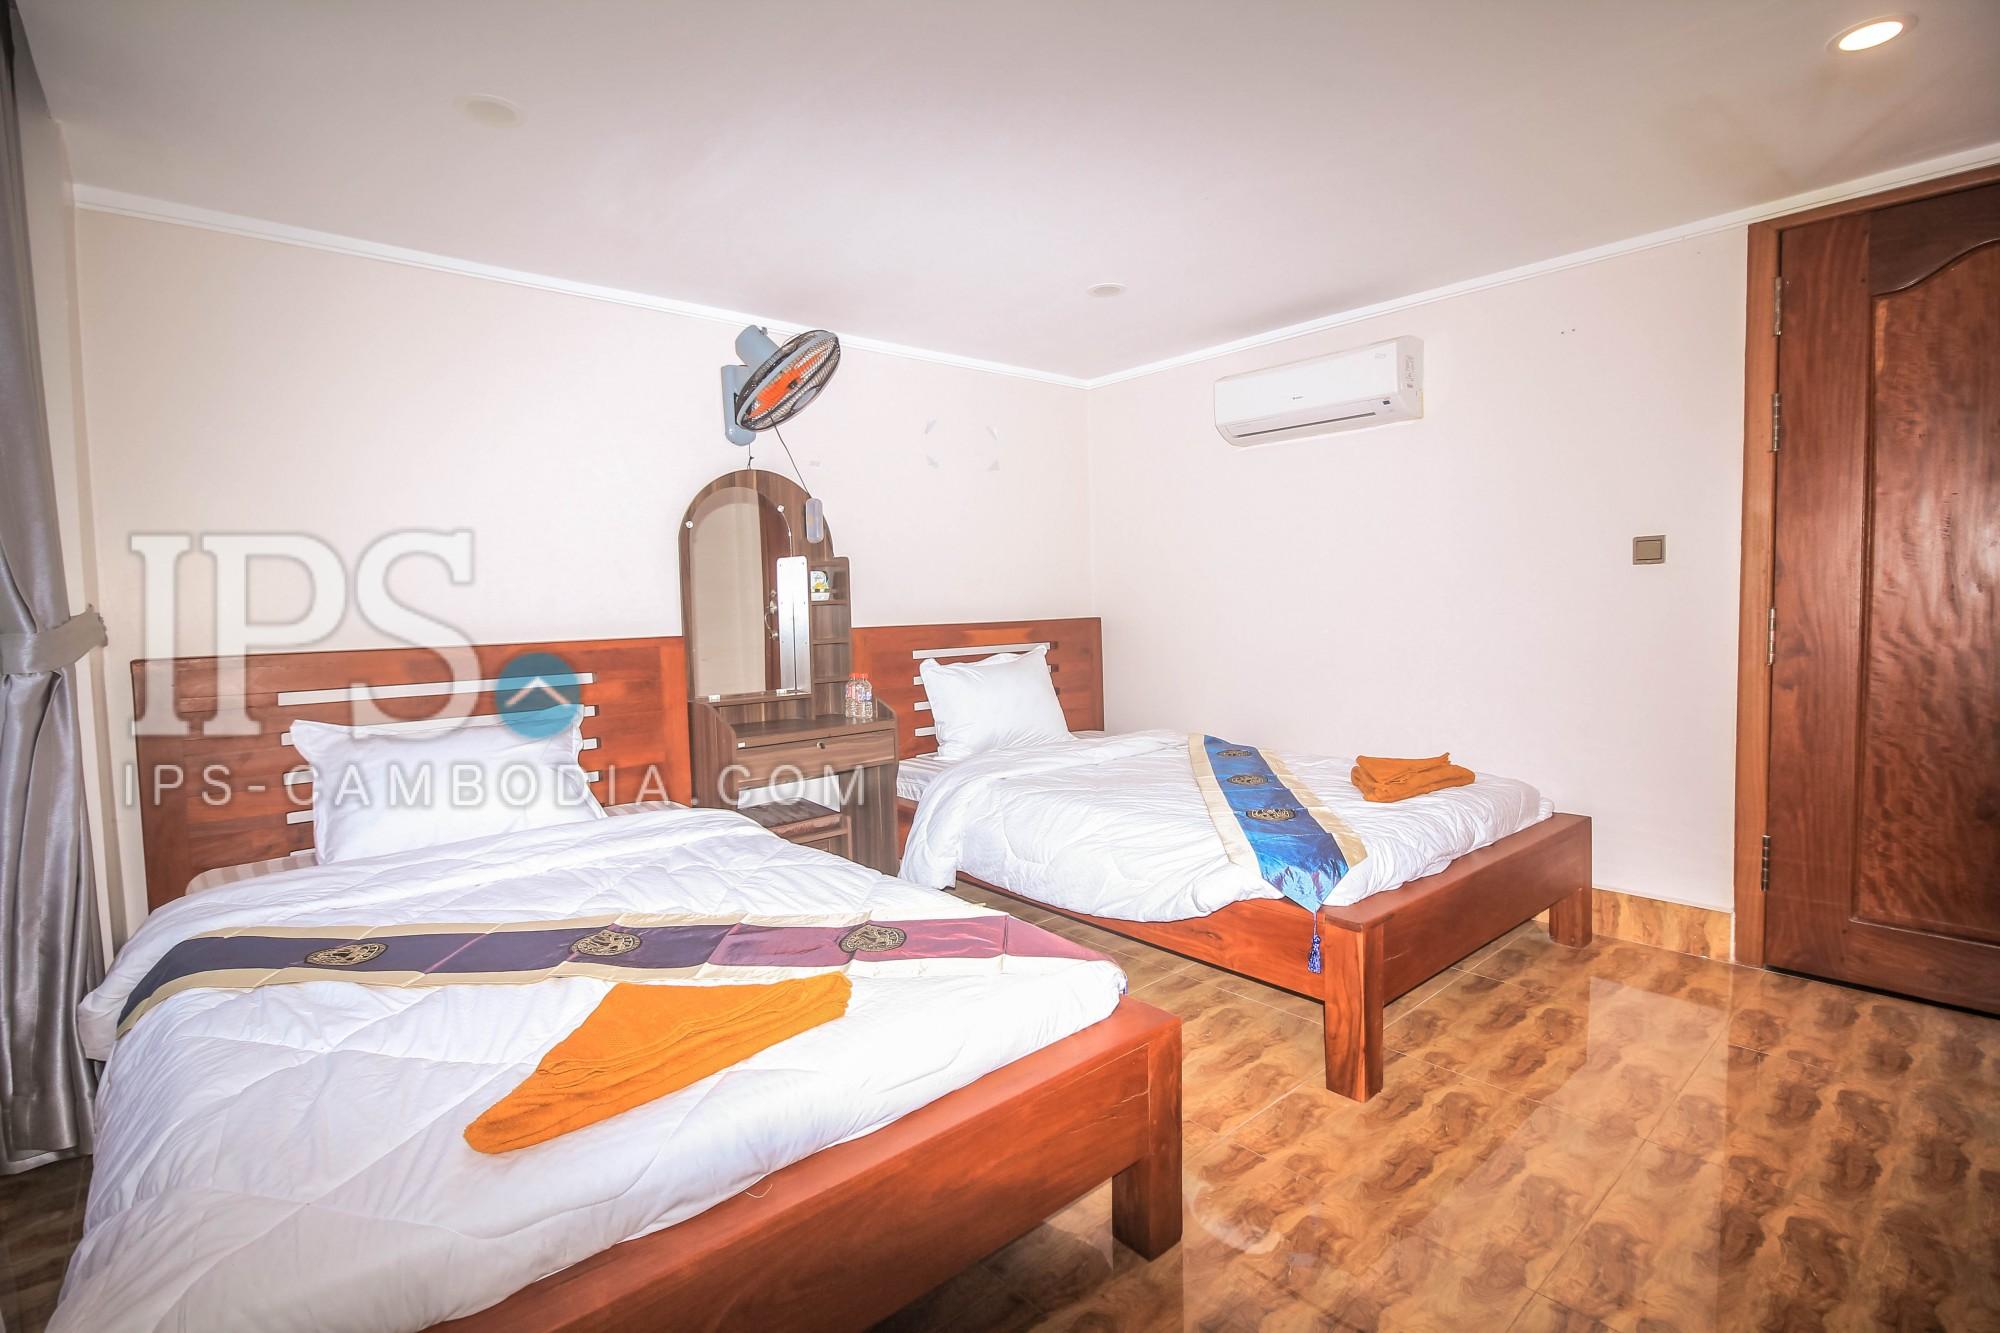 3rd Floor - 2 Bedroom Serviced Apartment For Rent - Siem Reap